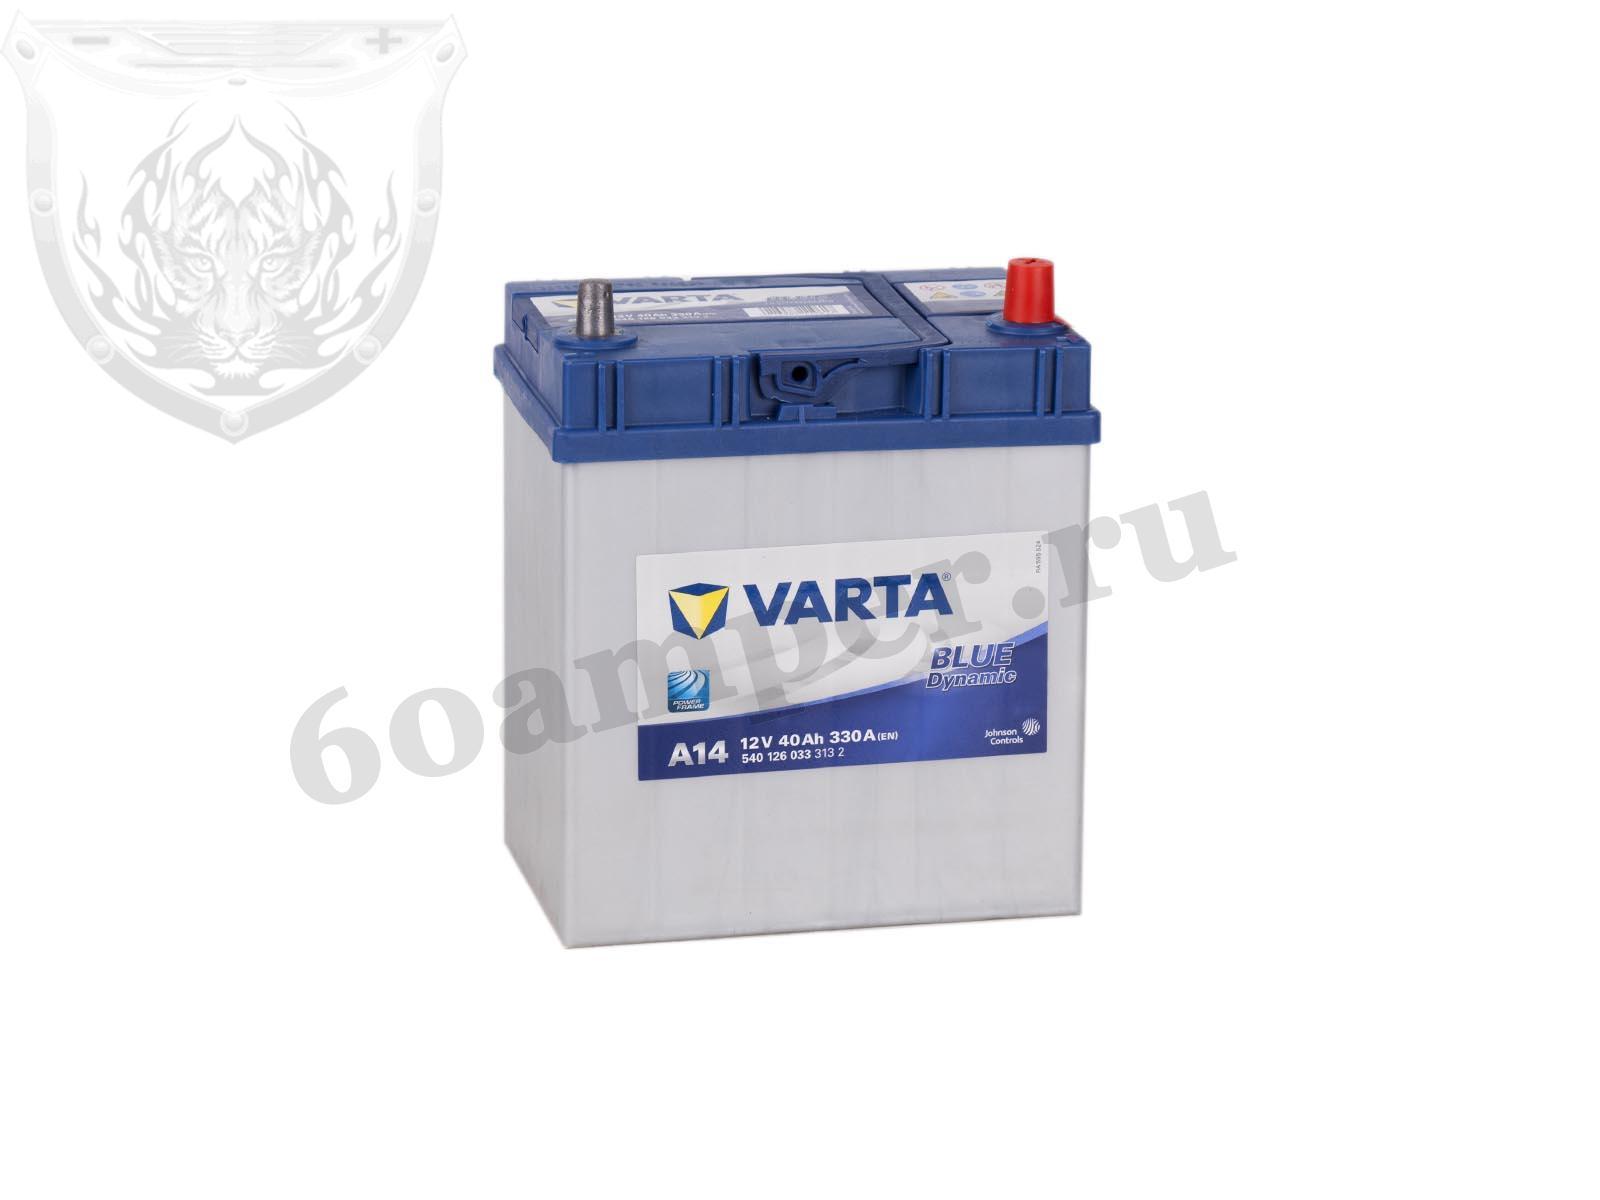 VARTA 40 А/ч Обратный BLUE A14 (540 126 033)